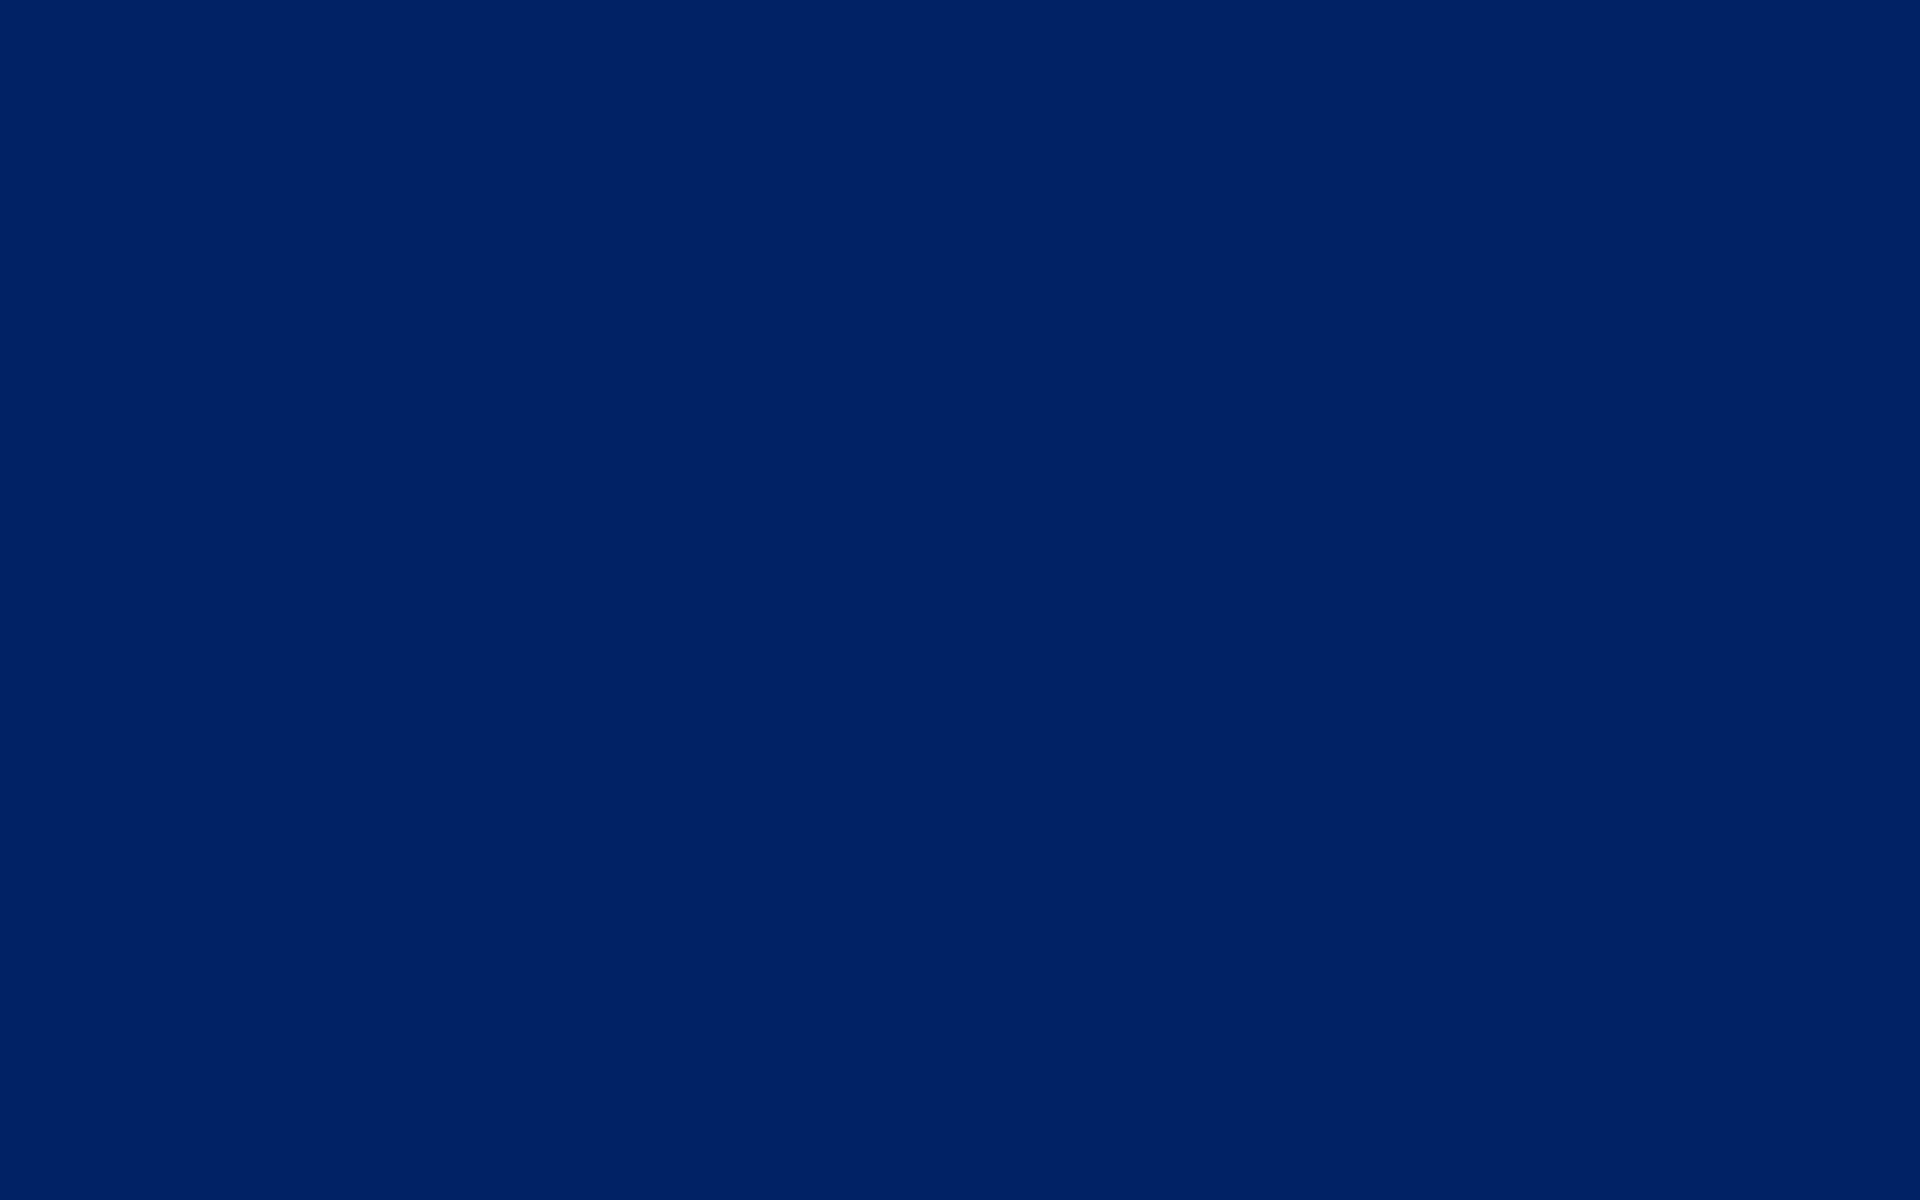 Royal Blue Backgrounds (43+ Images